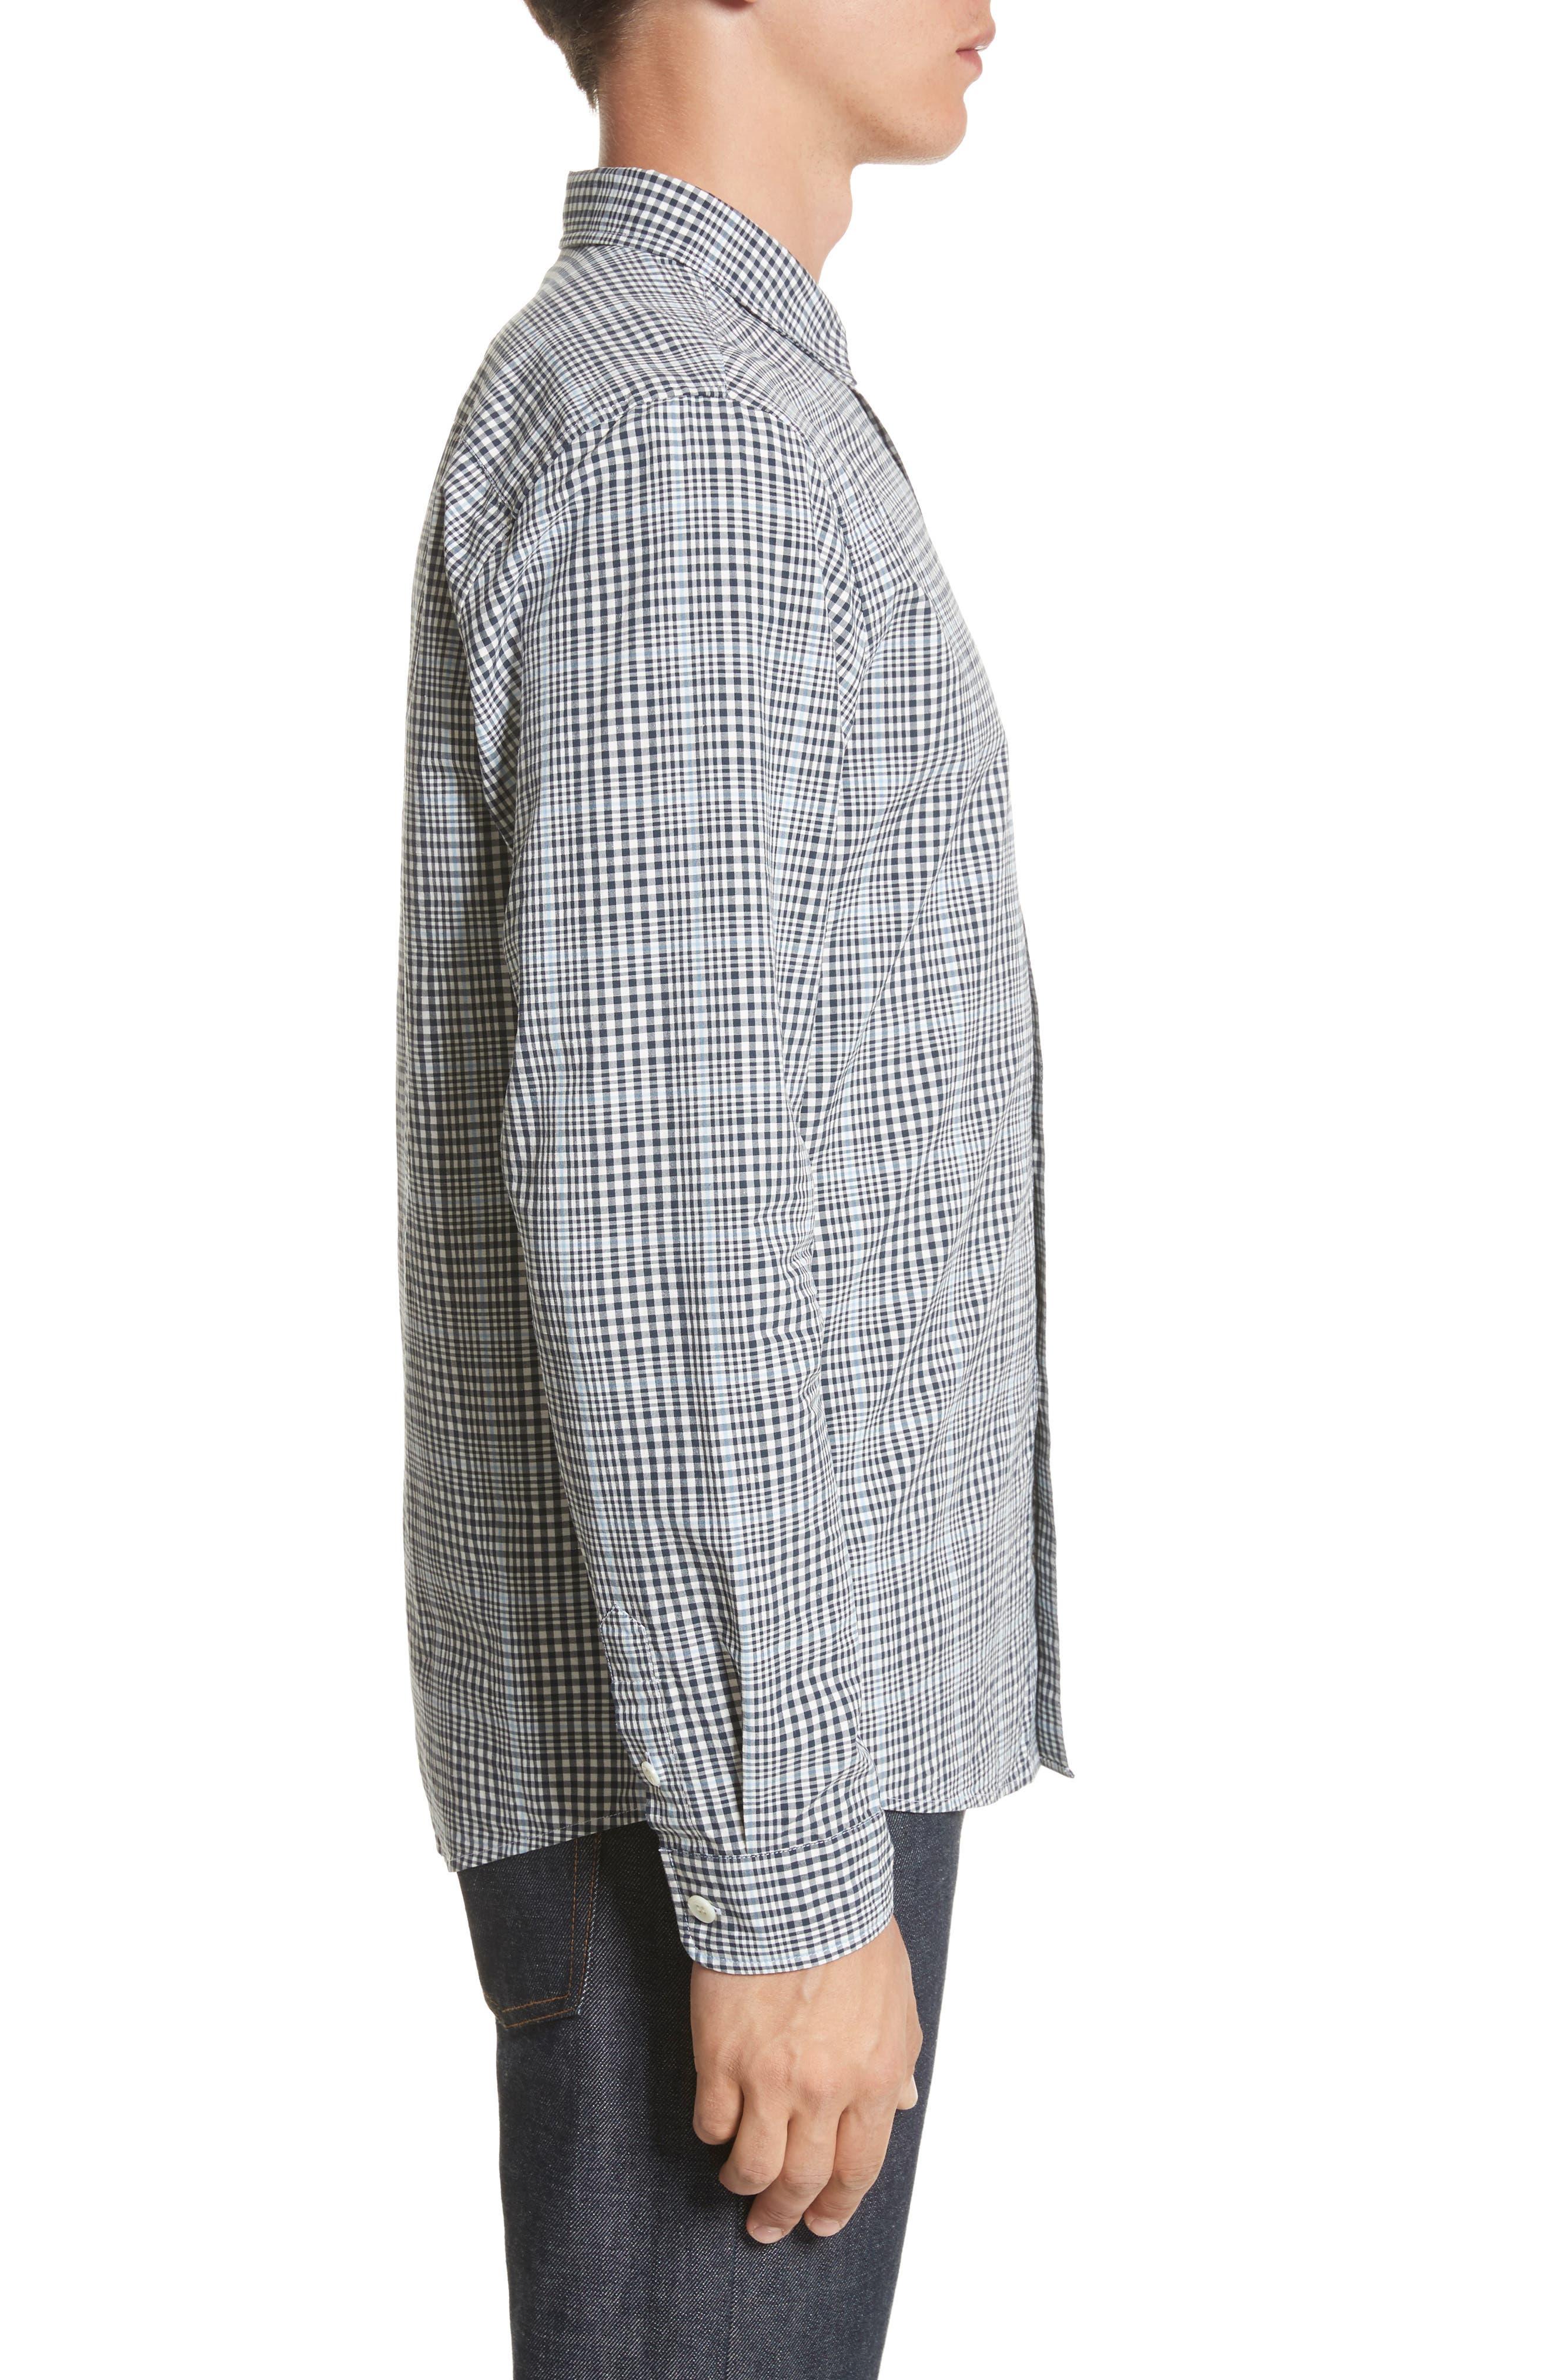 Alternate Image 3  - A.P.C. John Check Woven Shirt